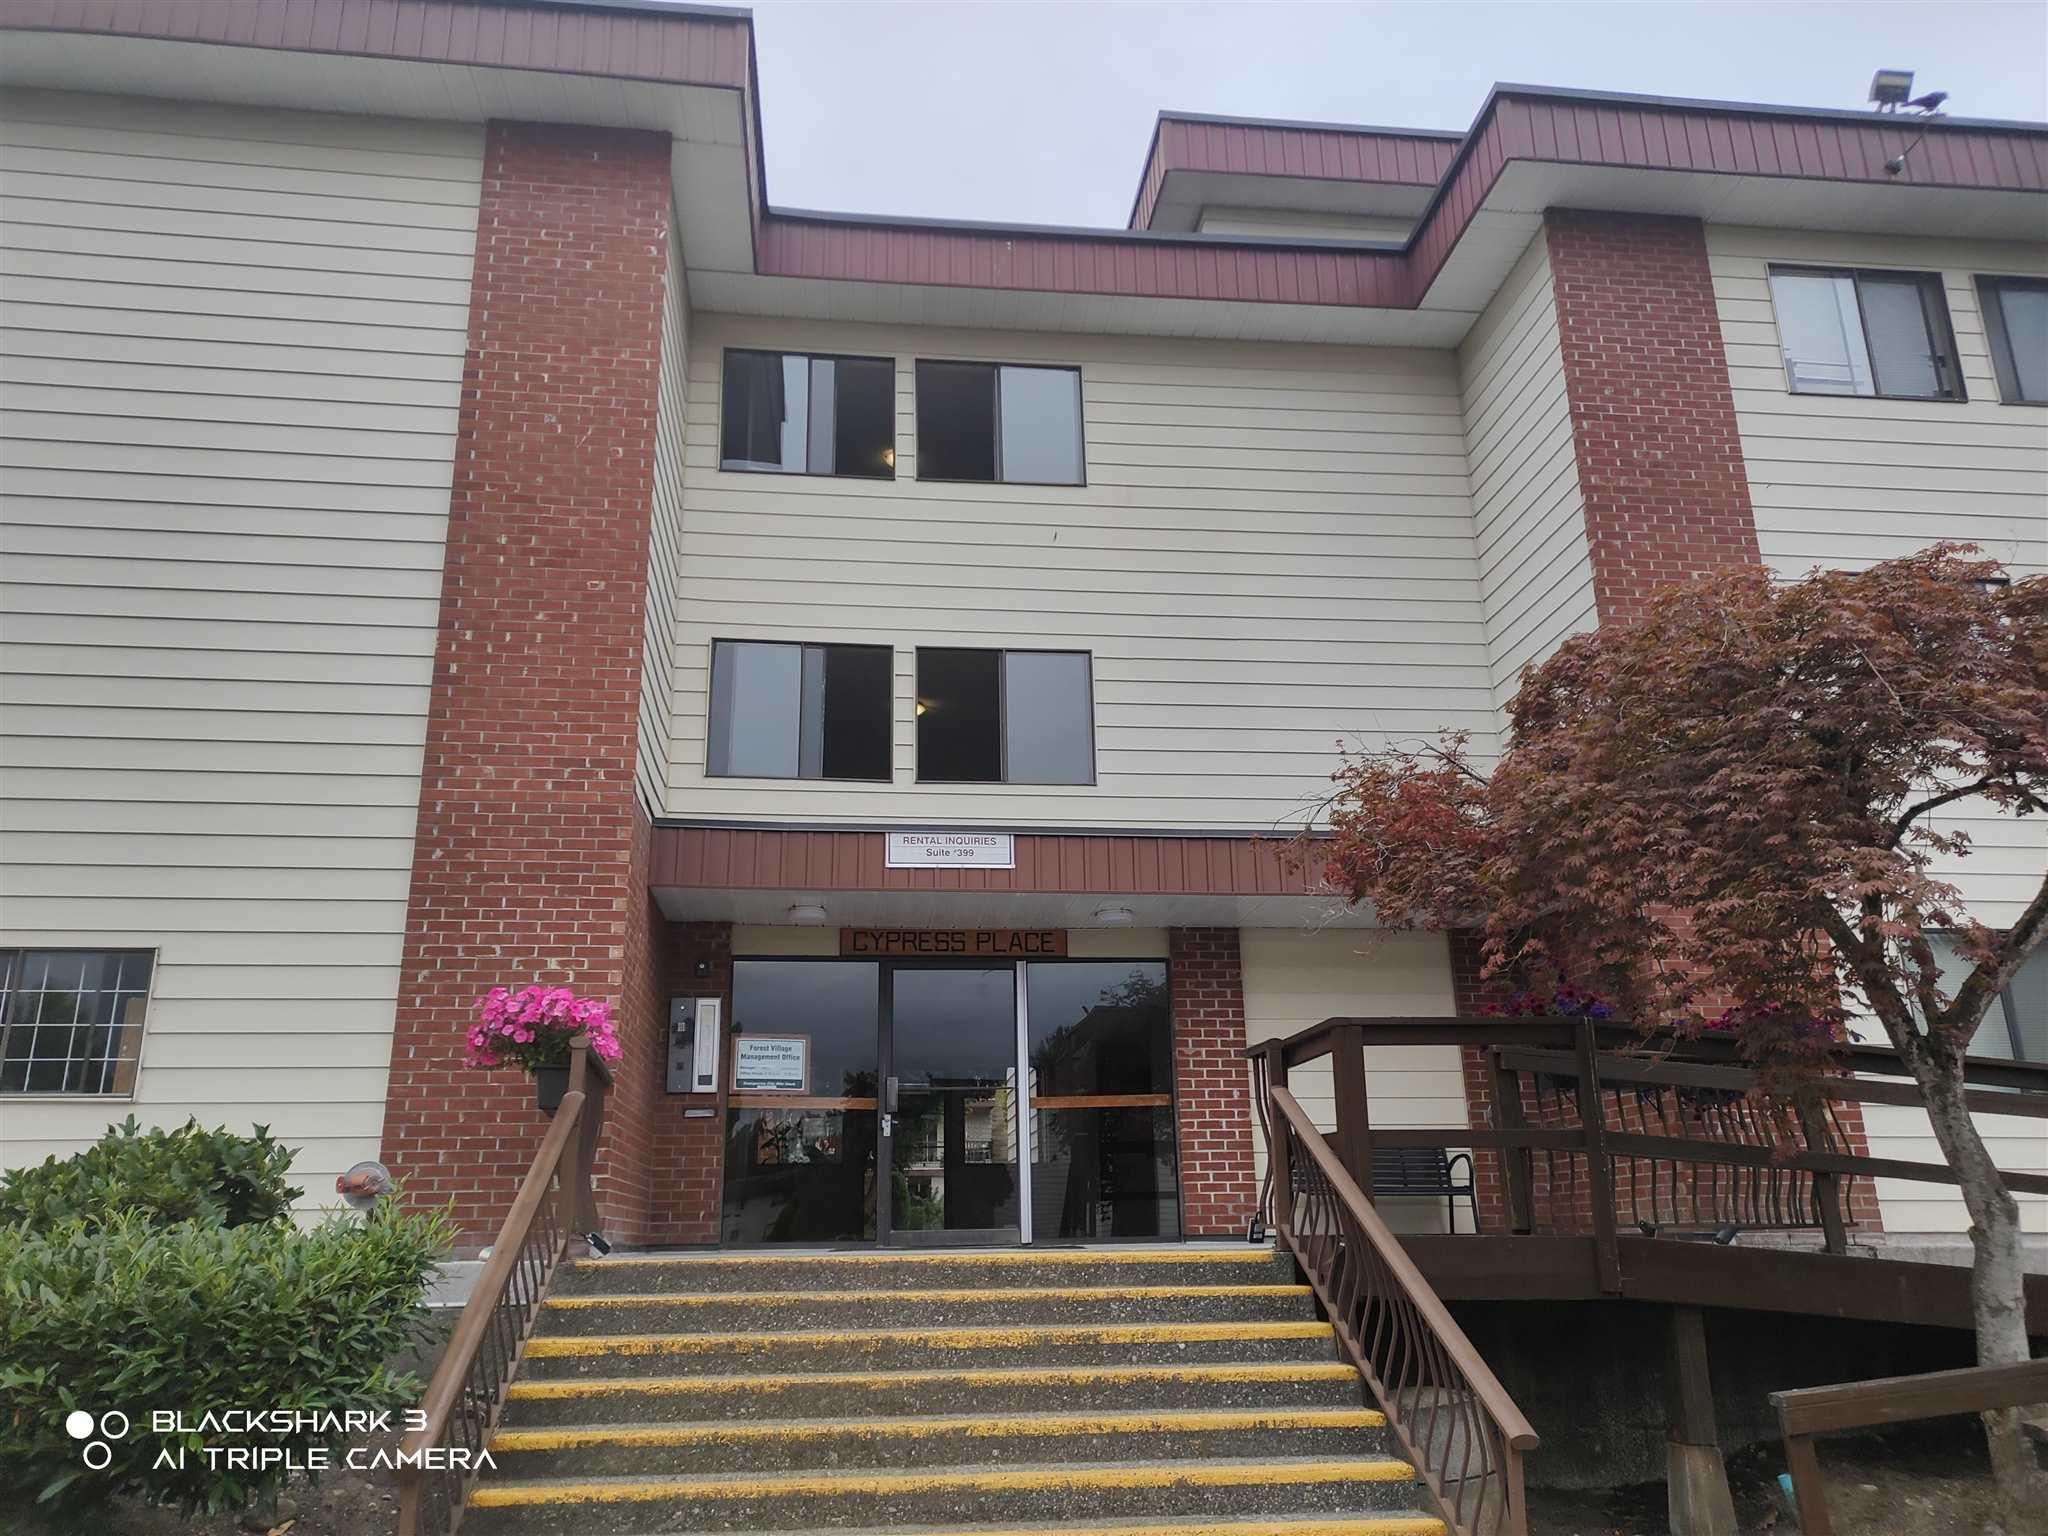 341 1909 SALTON ROAD - Central Abbotsford Apartment/Condo for sale, 2 Bedrooms (R2604545) - #1